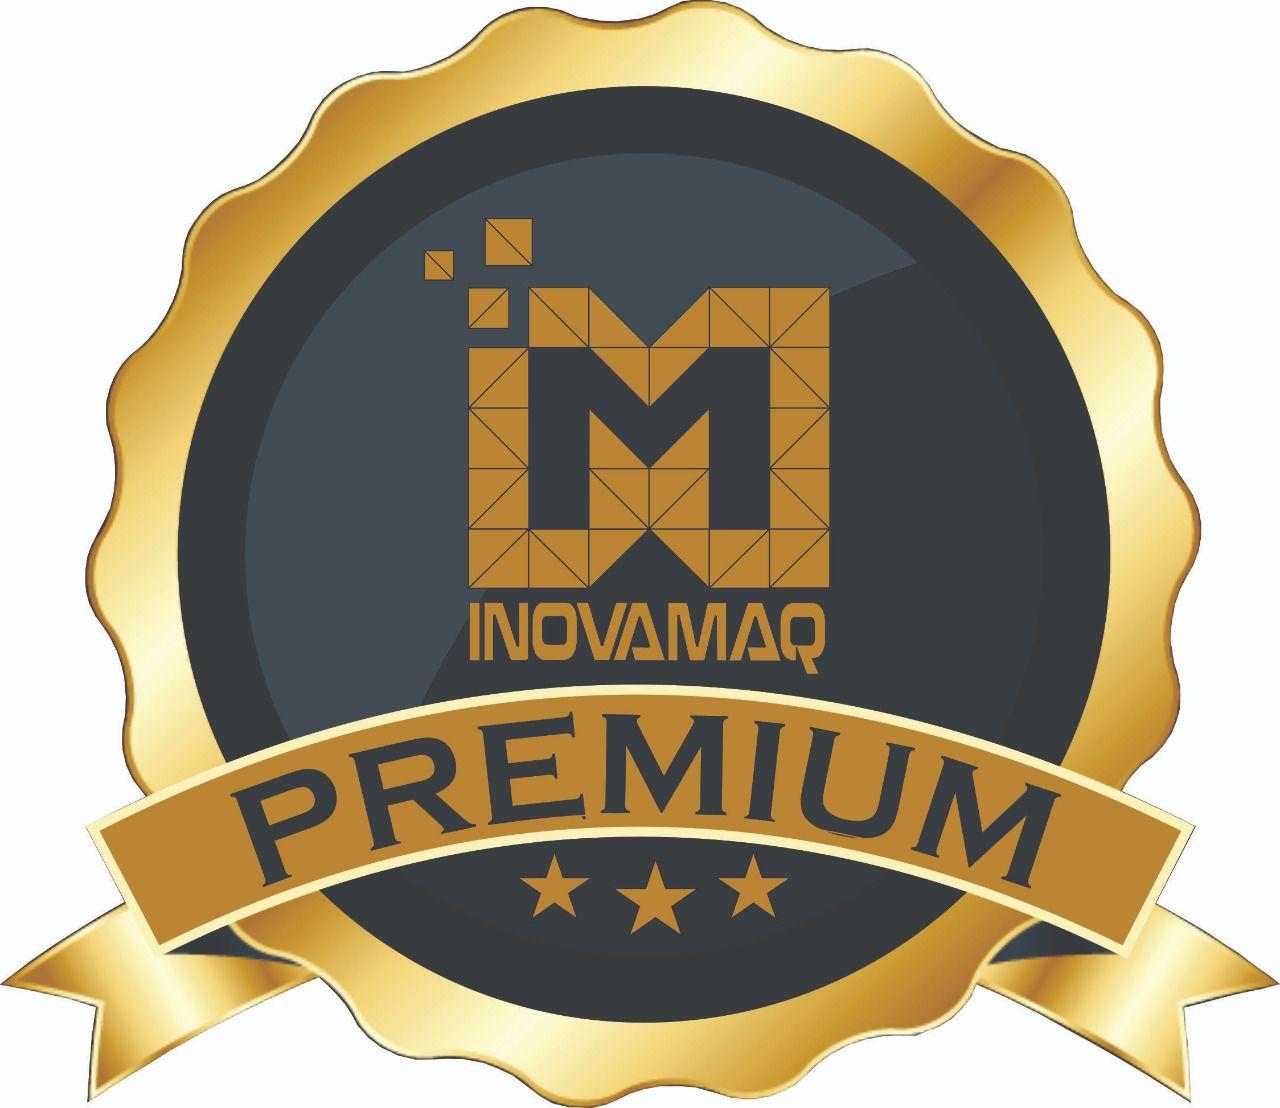 Máquina de Algodão Doce Industrial Digital - AD-50 Premium - Inovamaq